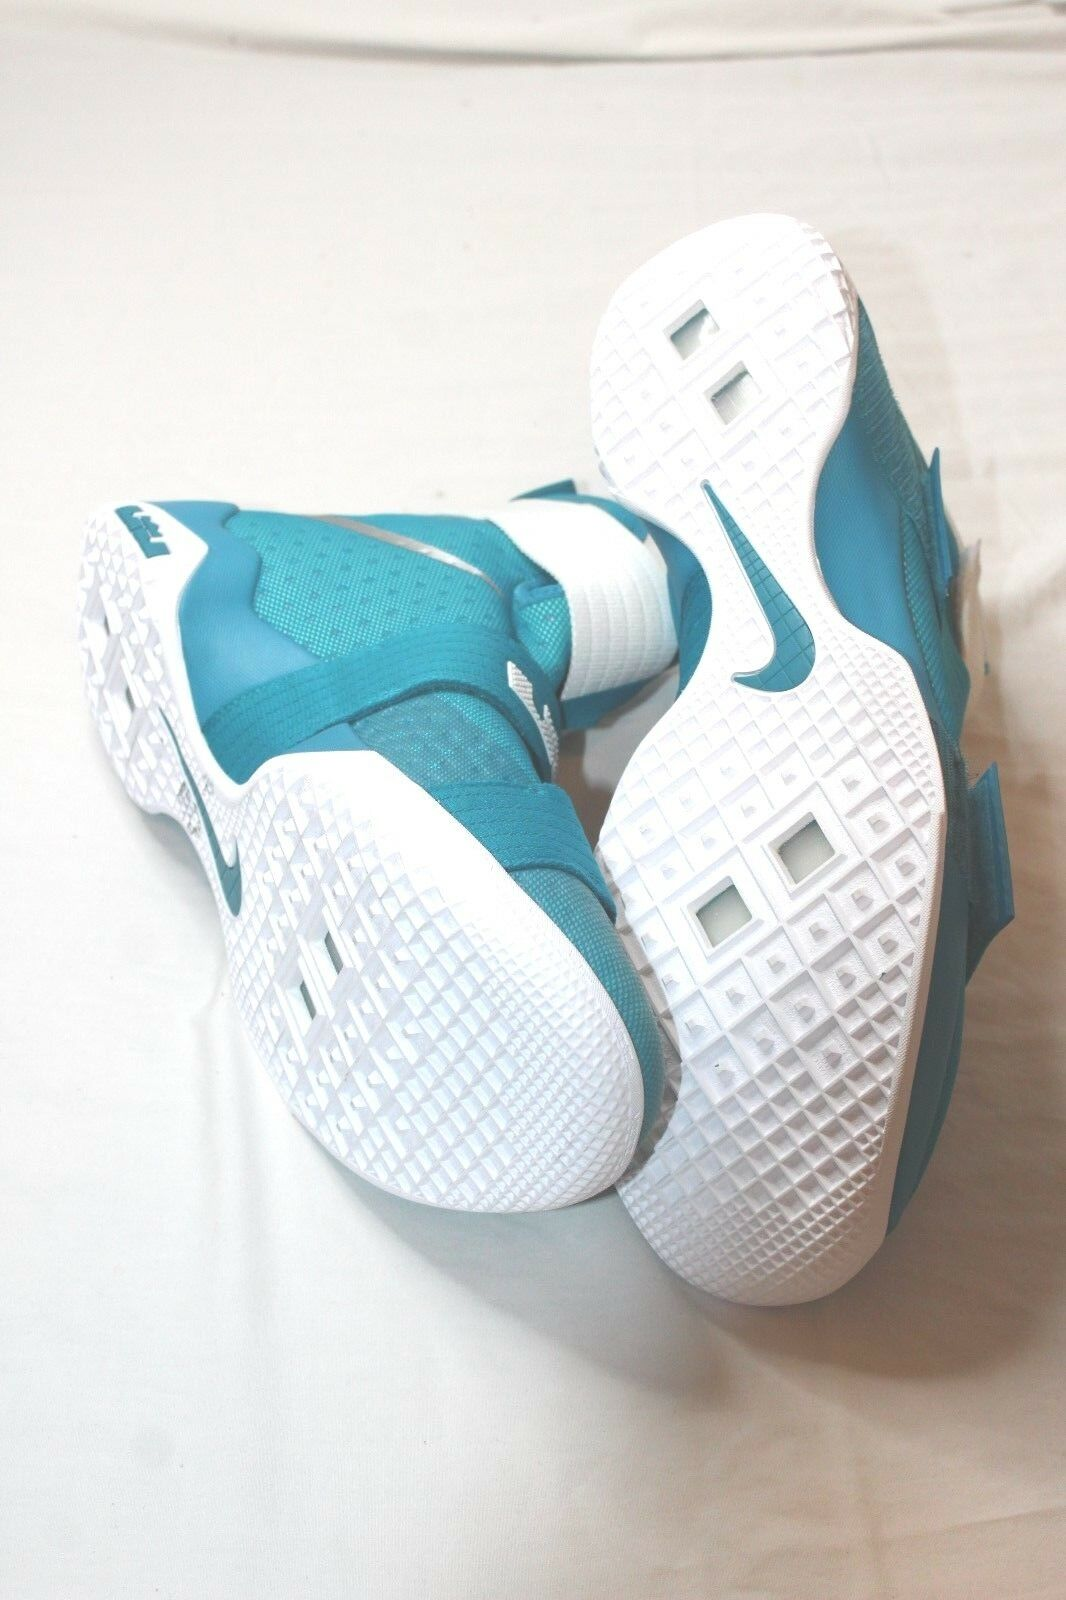 Nike LeBron Soldier 10 10 10  X 856489-332 Turquoise White Size 17.5 Retail  130 New 0c6303